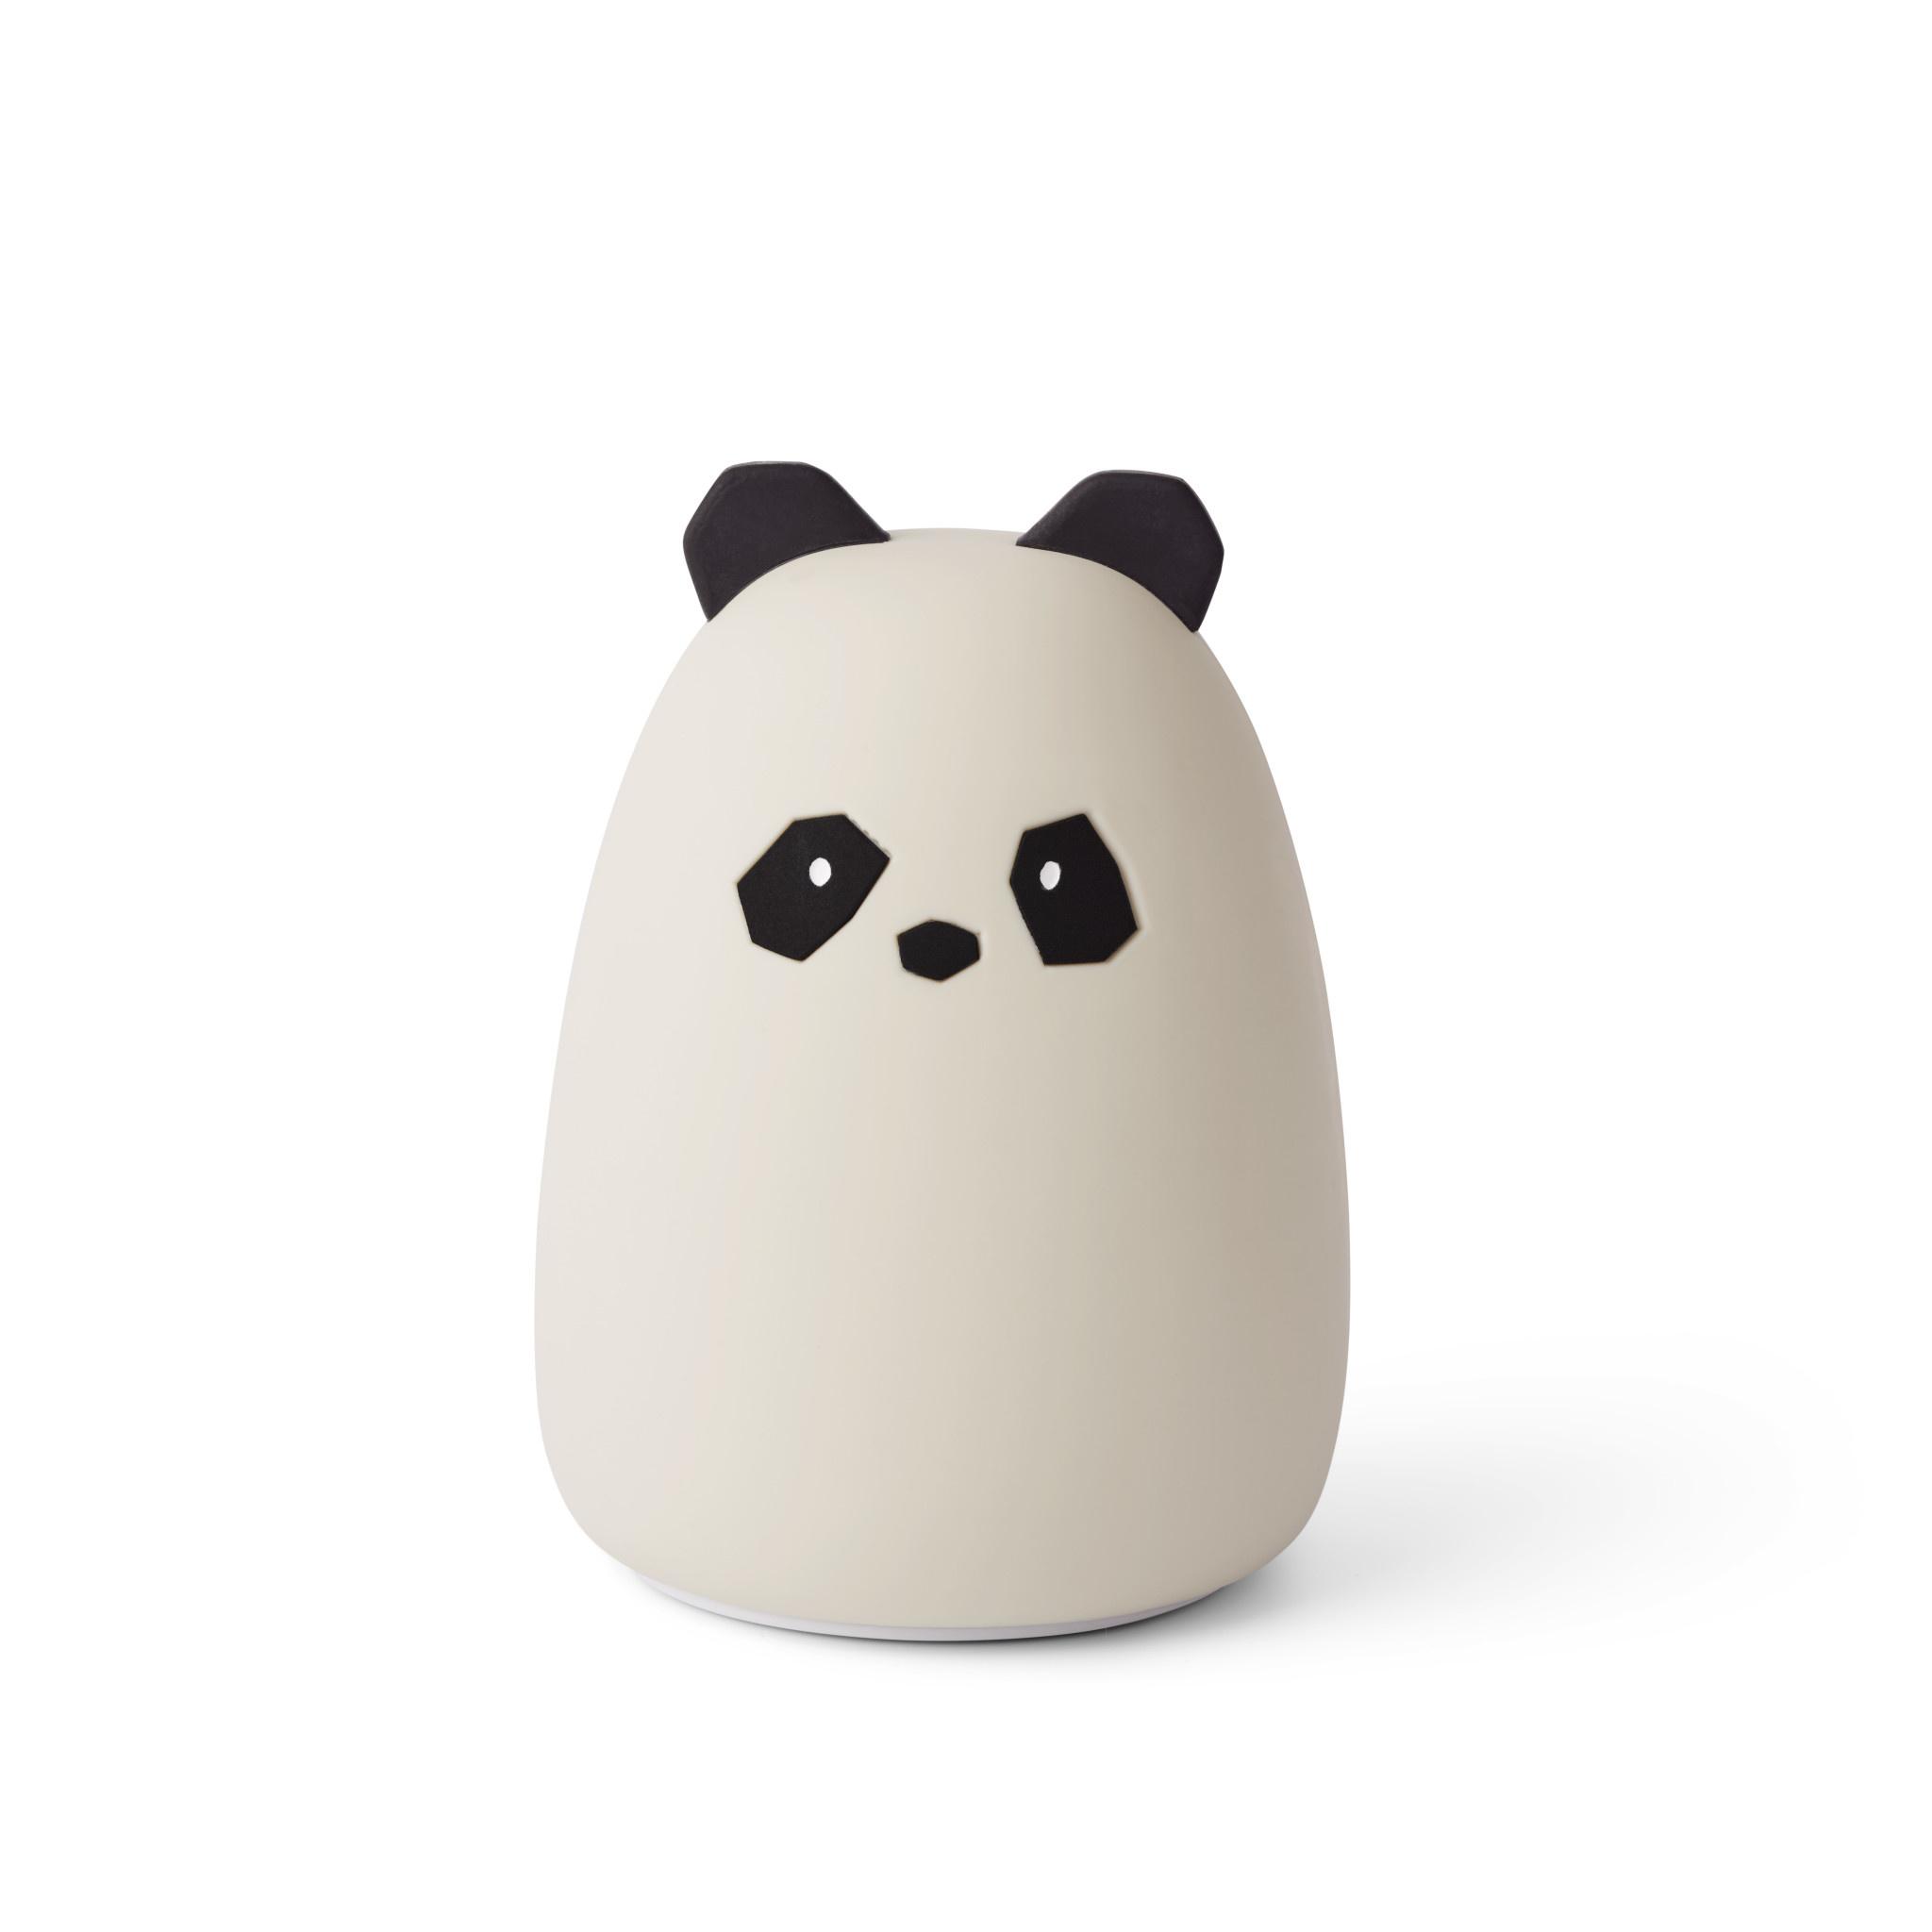 Winston night light panda creme de la creme-1